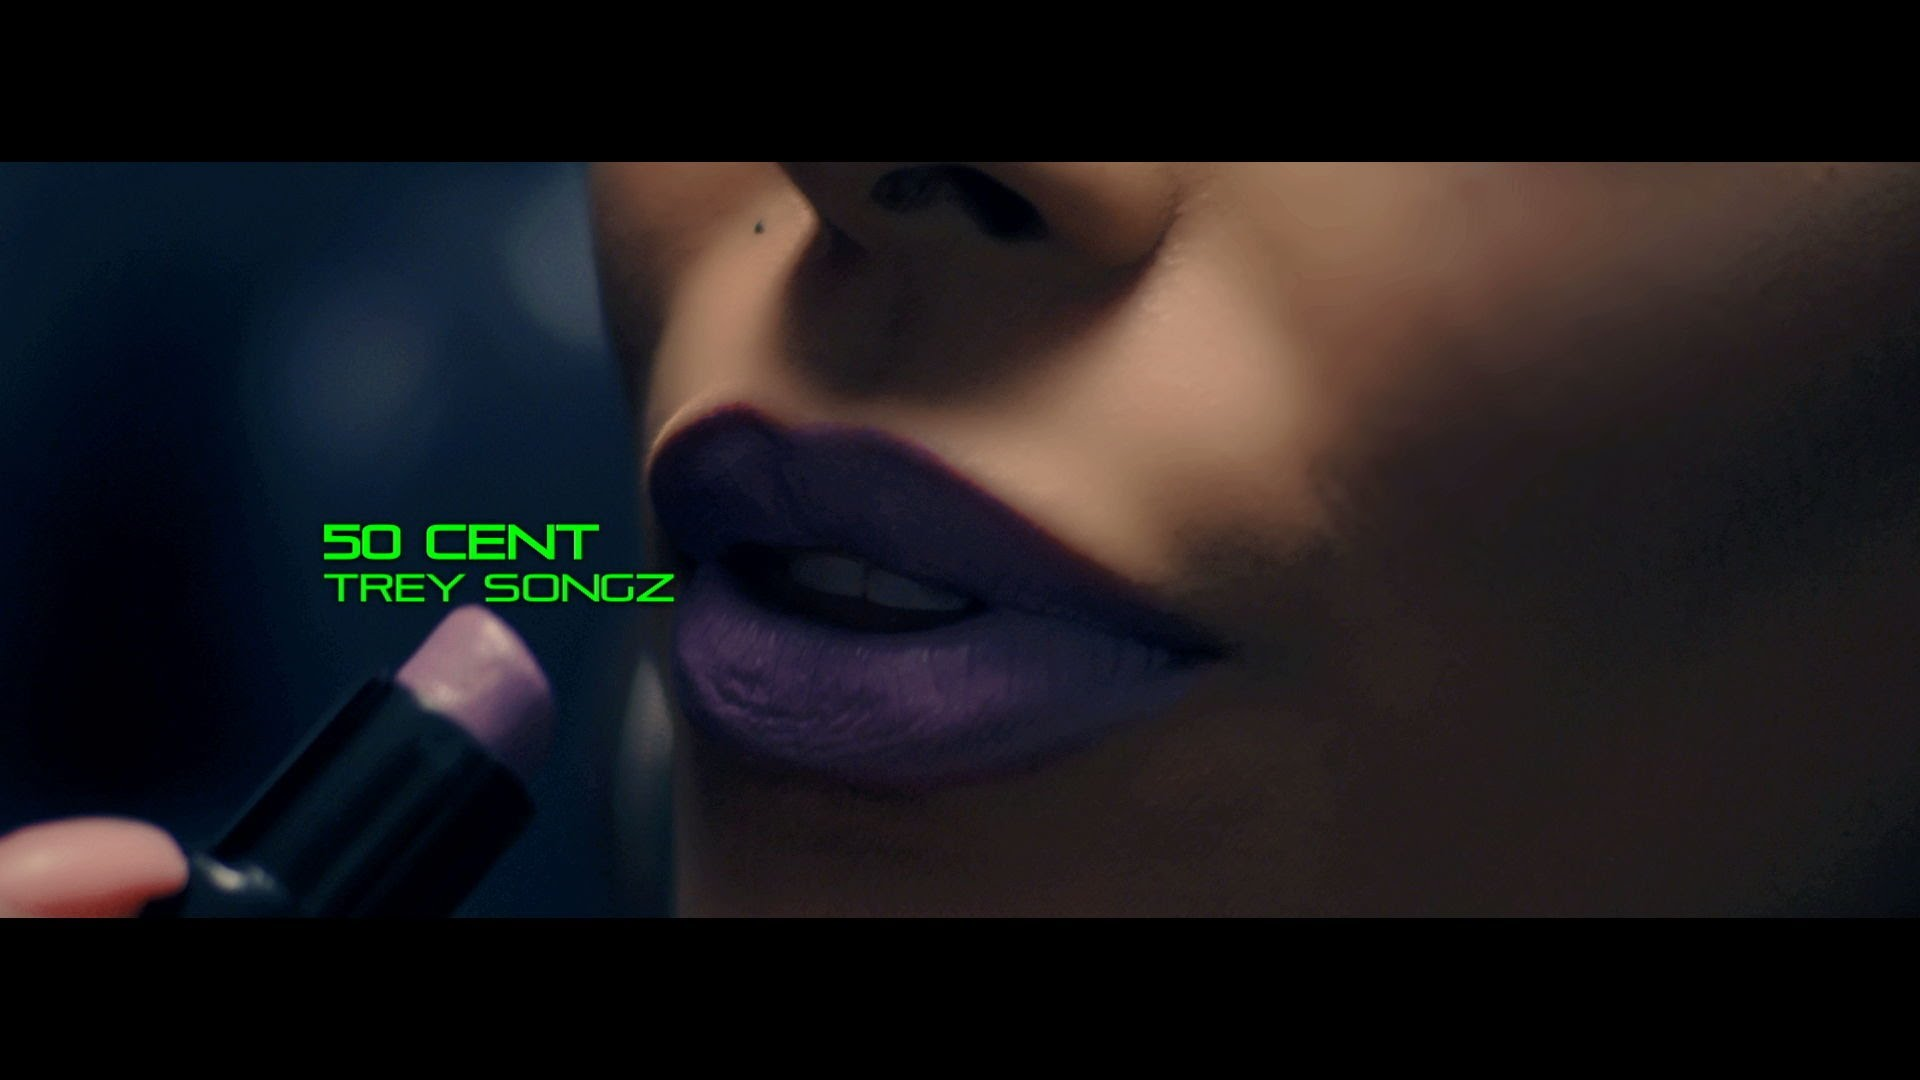 50 Cent Feat. Trey Songz – Smoke